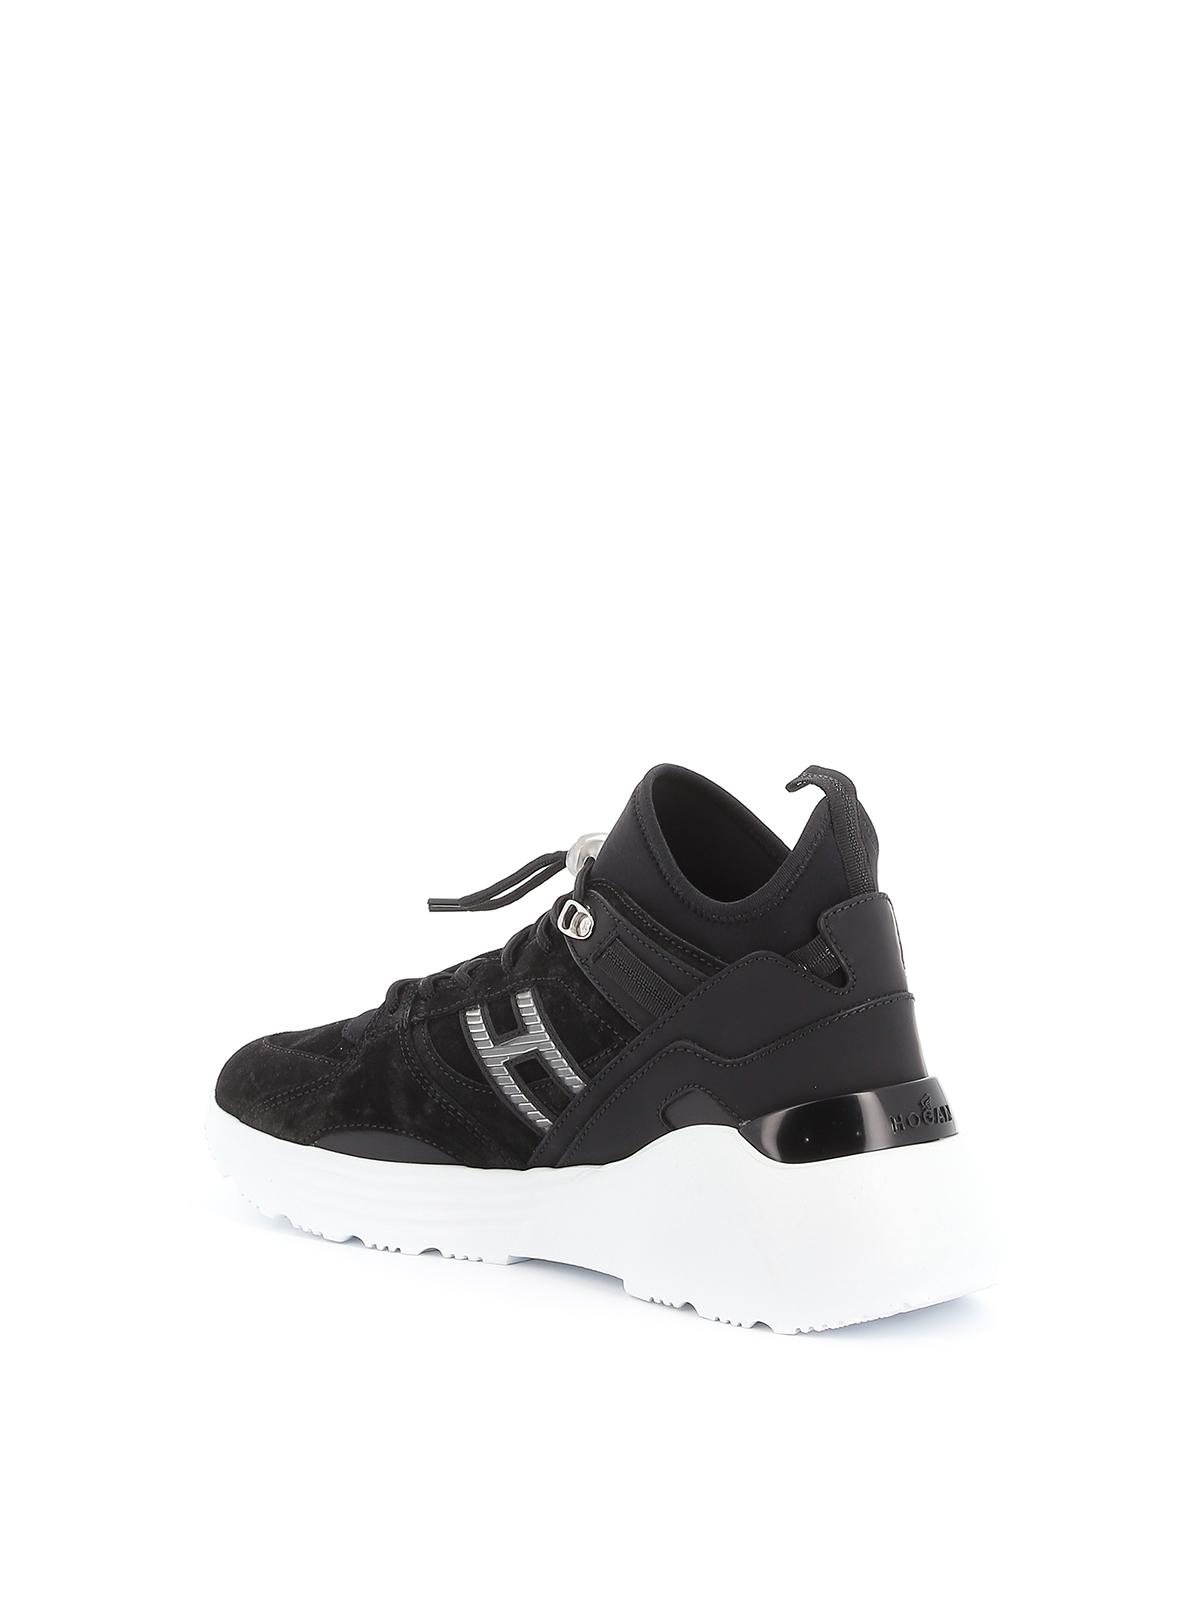 Trainers Hogan - H443 sneakers - HXM4430BX90LRPB999   Shop online ...